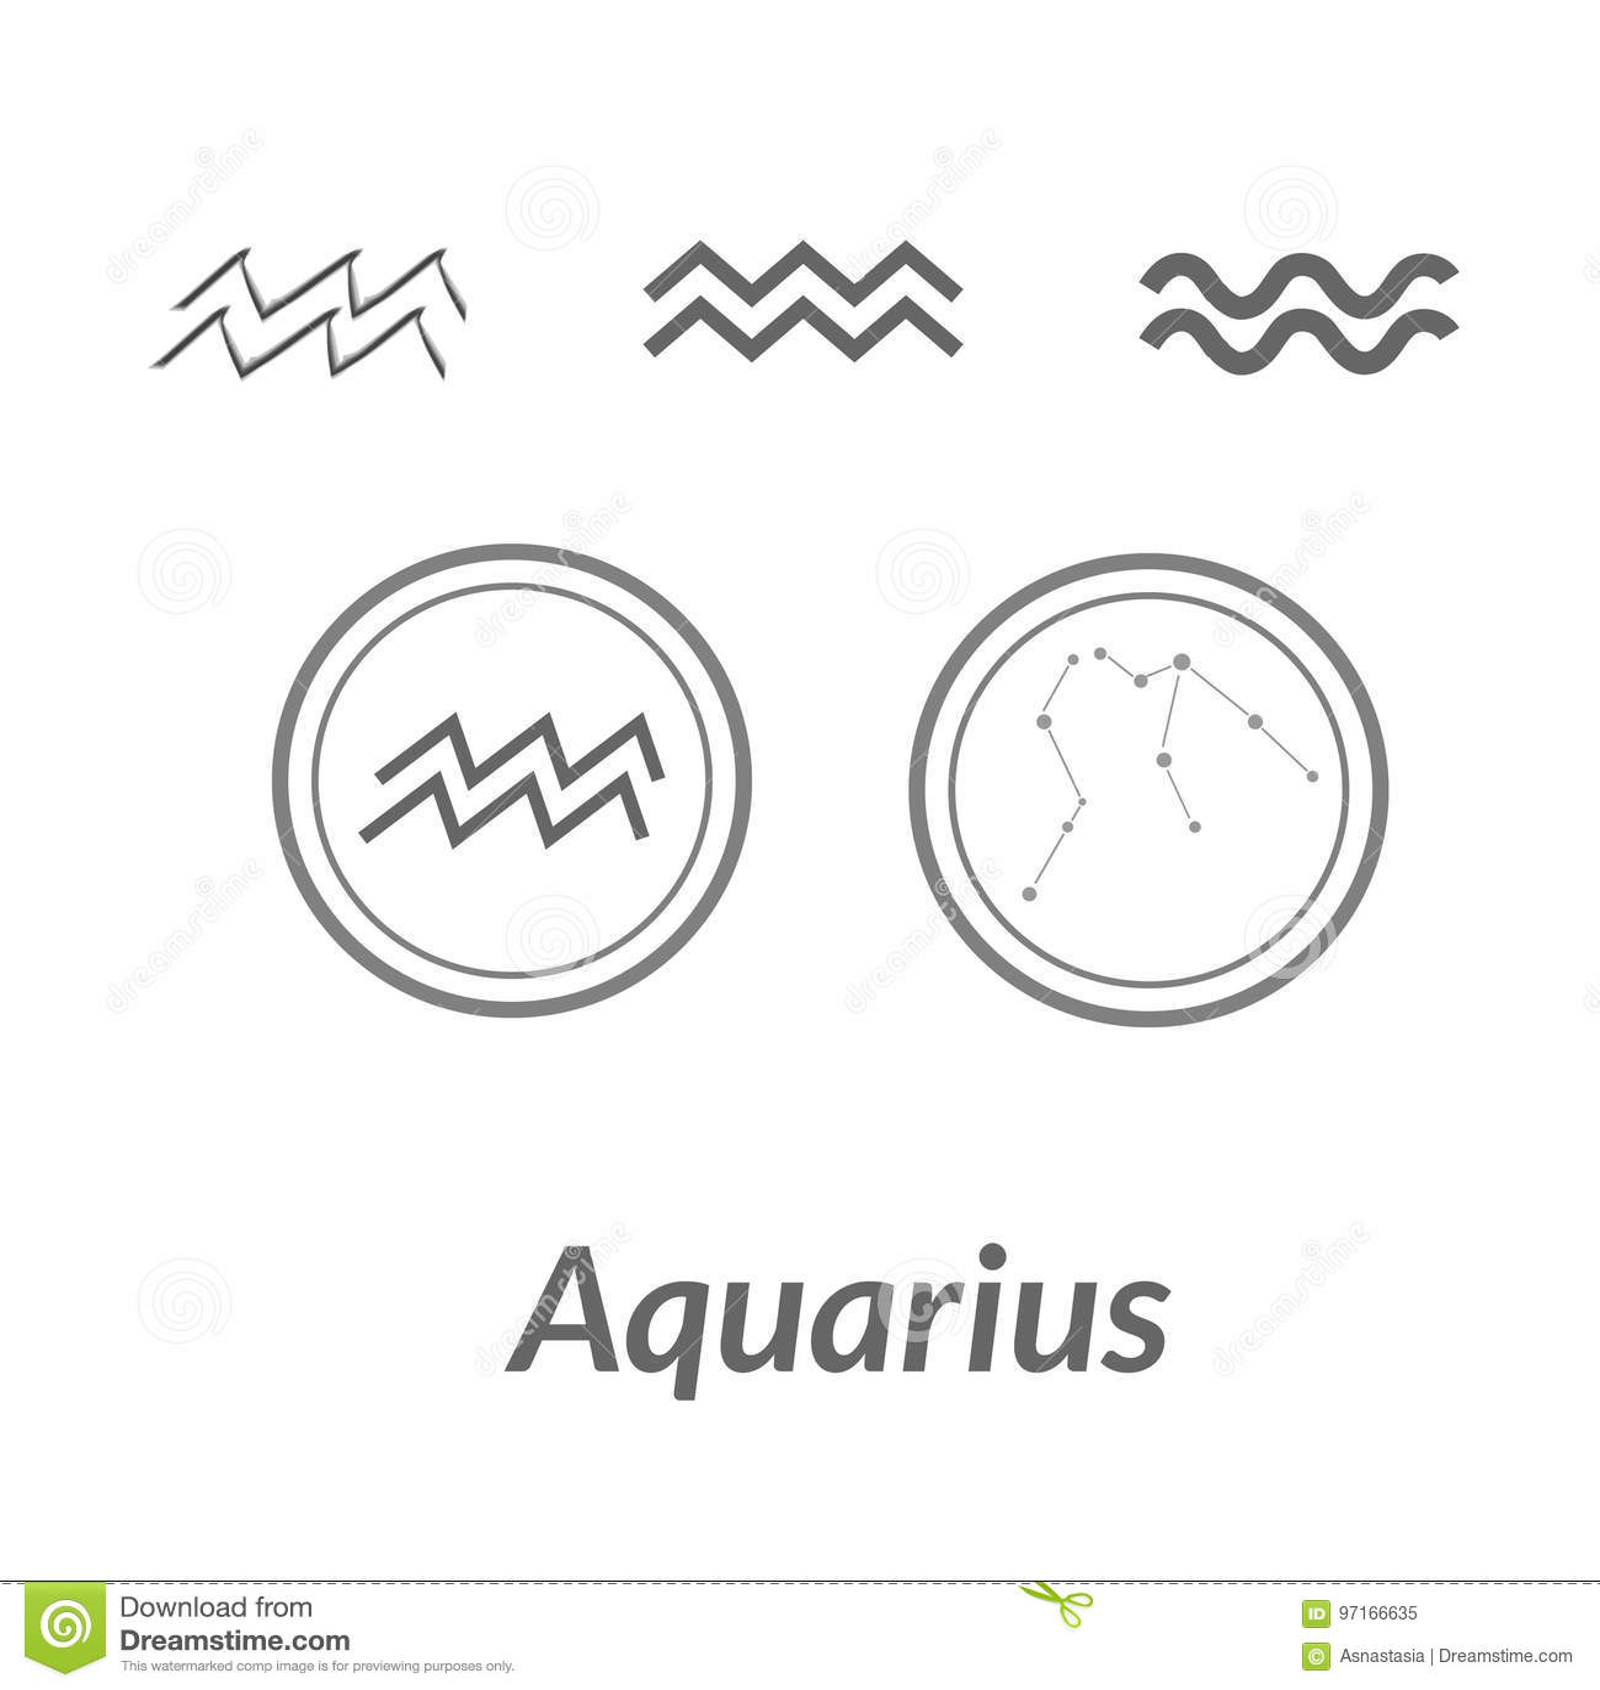 The water bearer aquarius sing star constellation vector element the water bearer aquarius sing star constellation vector element age of aquarius constellation zodiac symbol on light biocorpaavc Choice Image